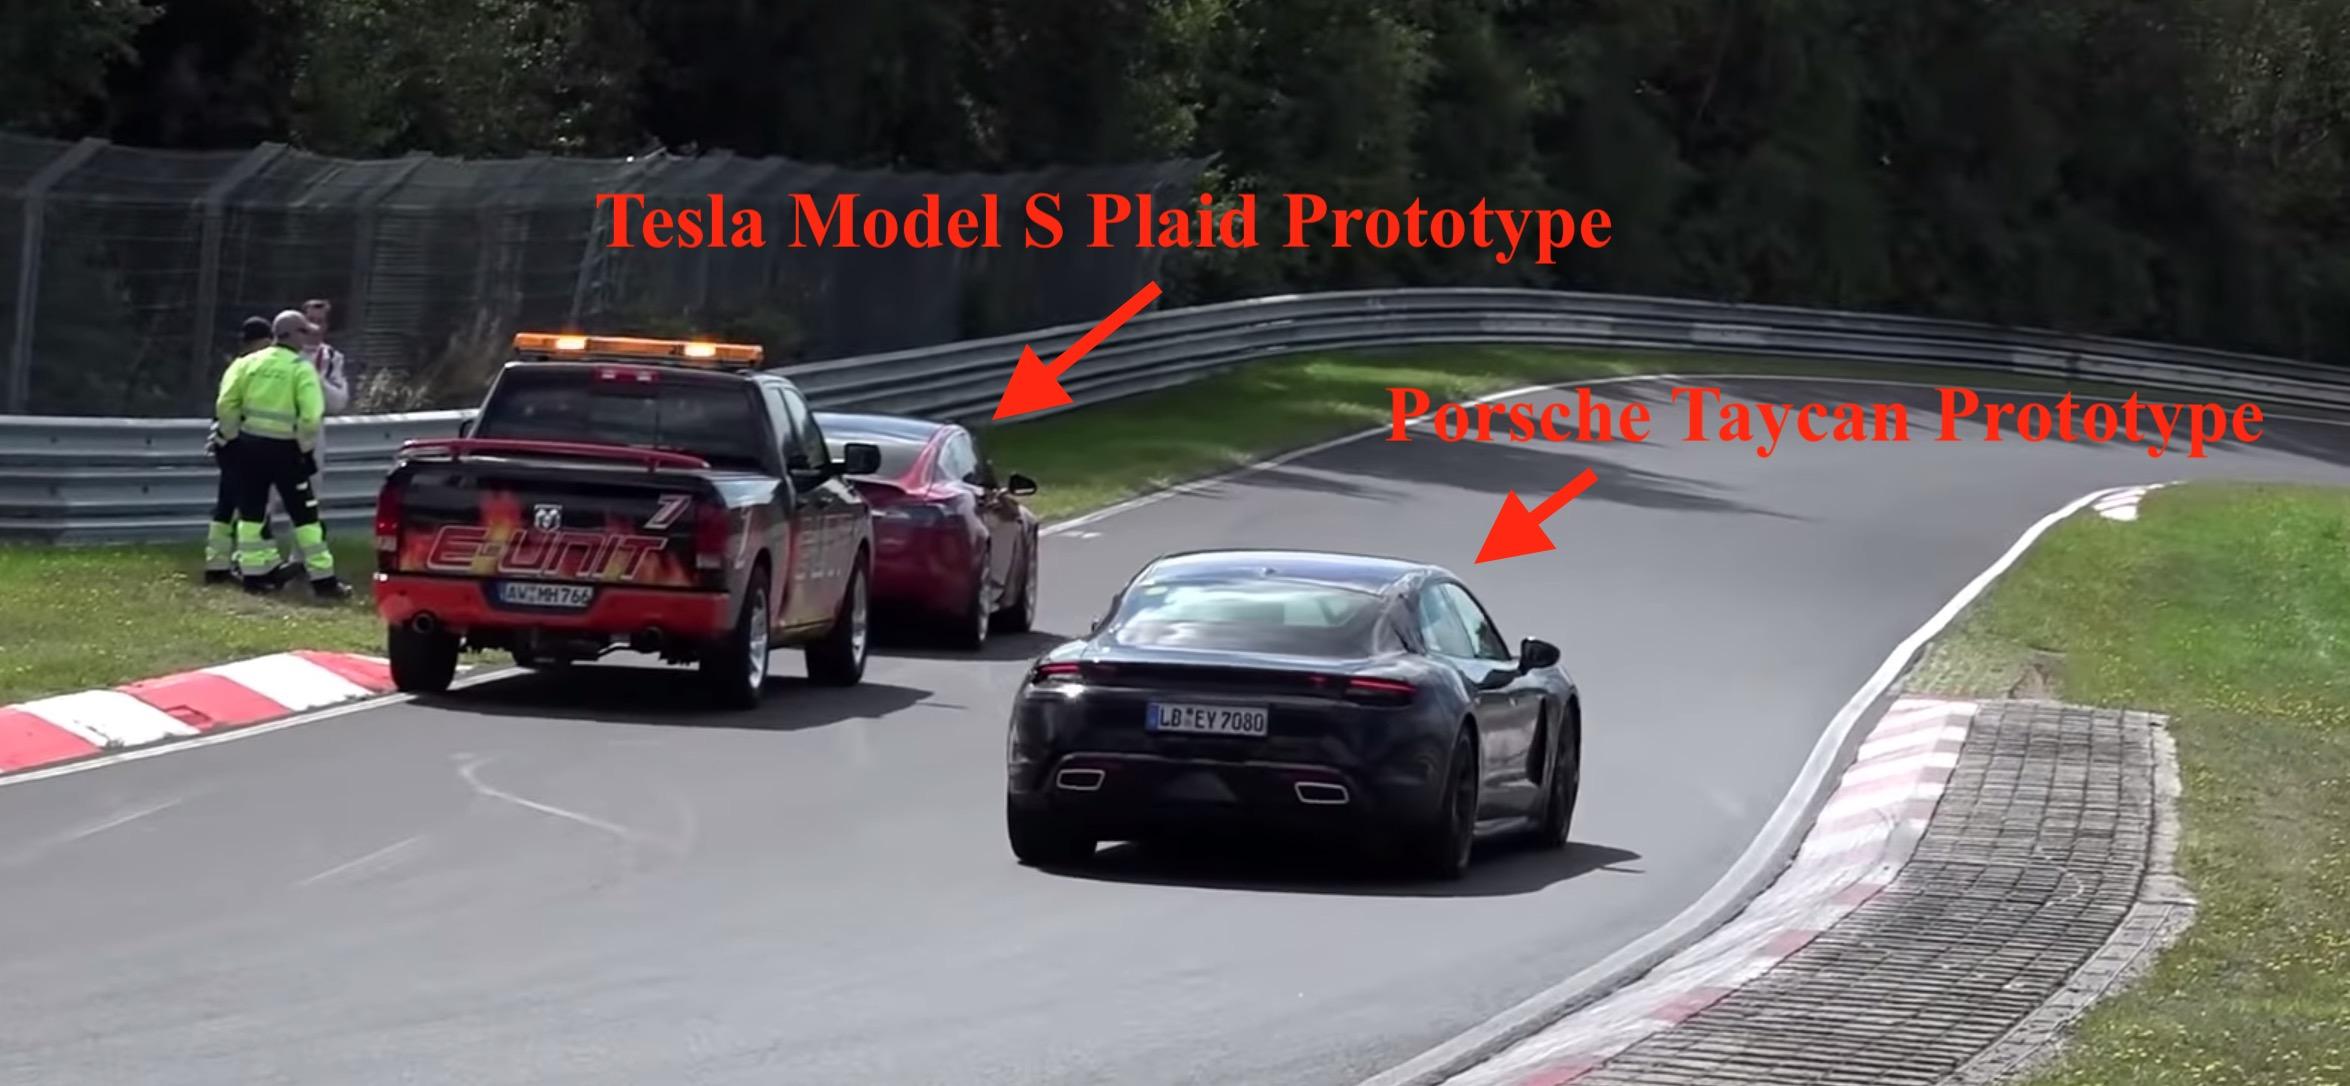 Tesla Model S prototype breaks down, Porsche Taycan drives by, and TSLA shorts go crazy - Electrek